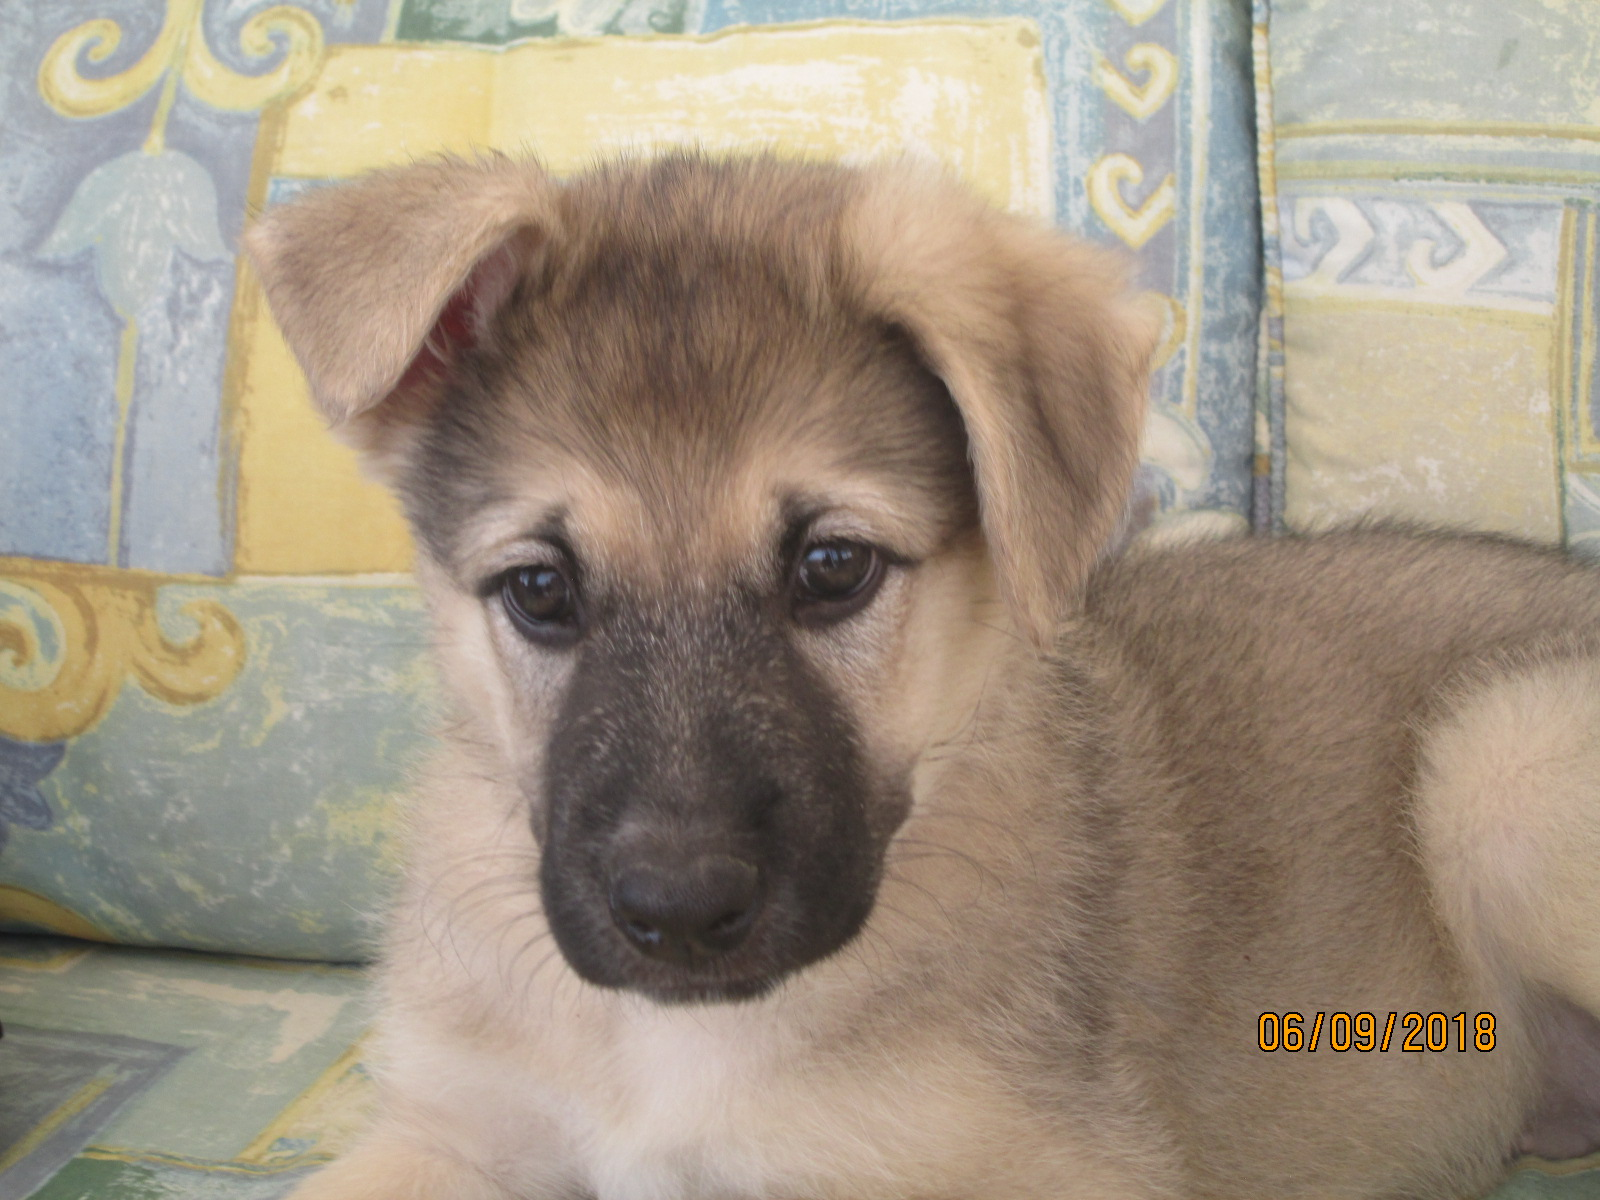 Miss Slinky 8 10 Week Old Female German Shepherd Cross Available For Adoption